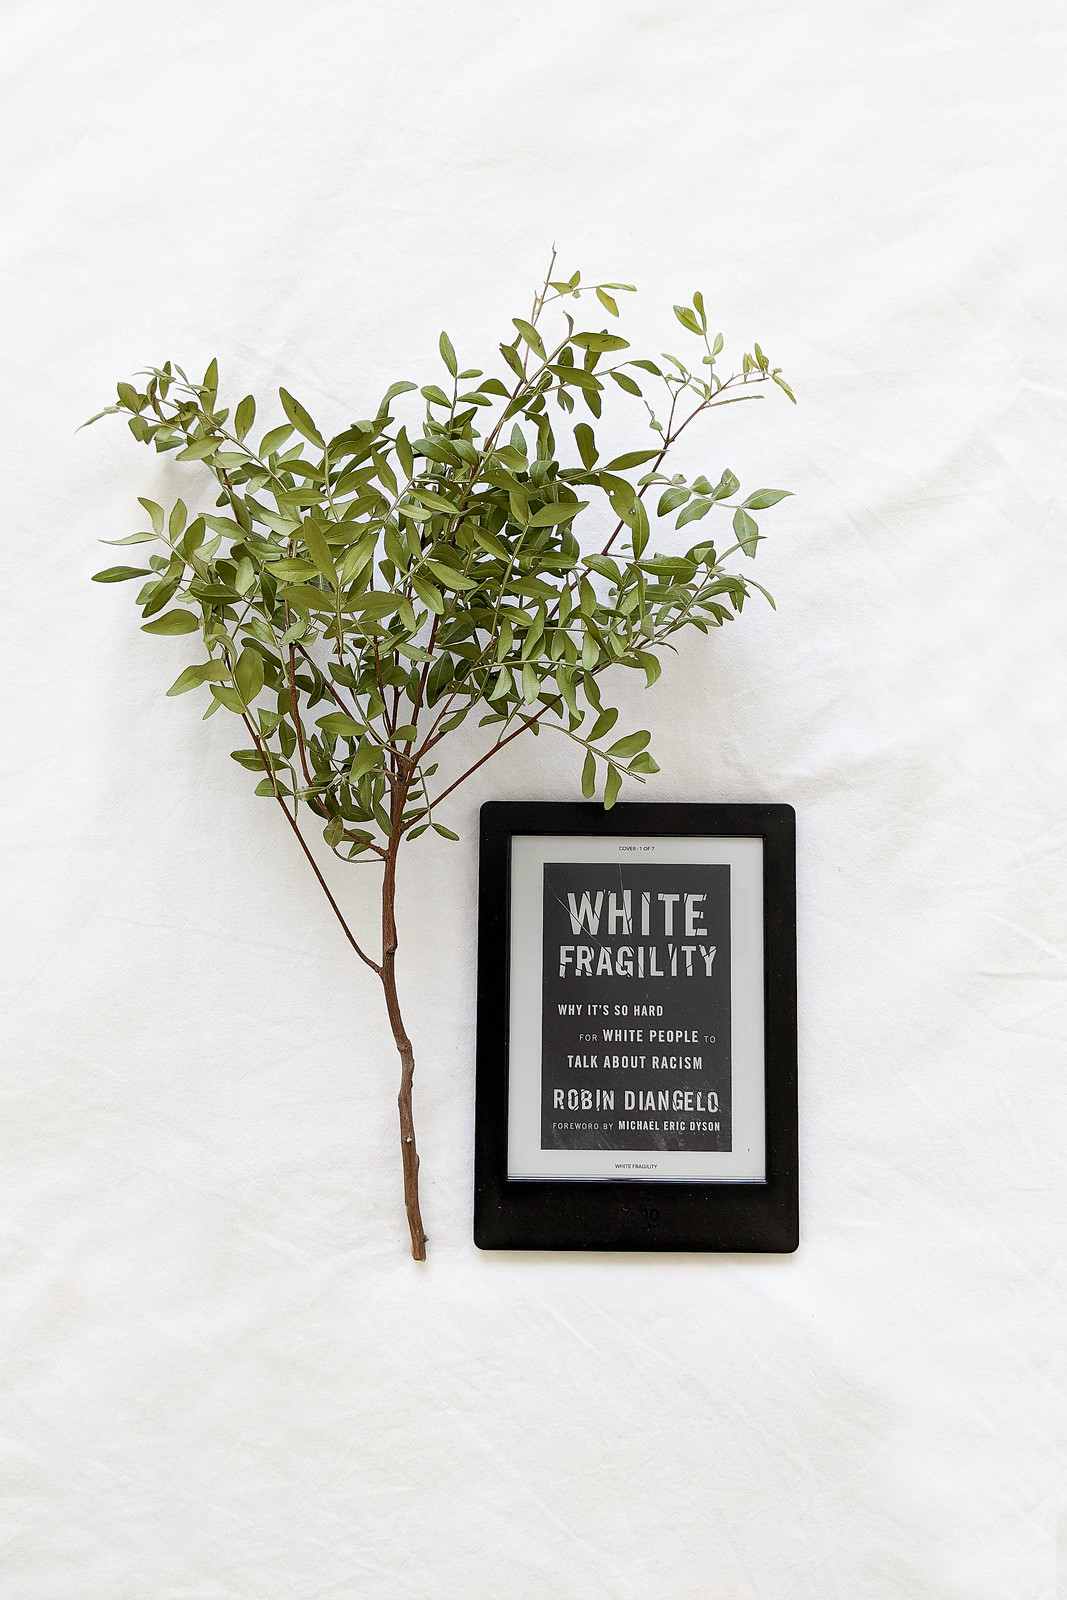 An Anti-Racist Reading List